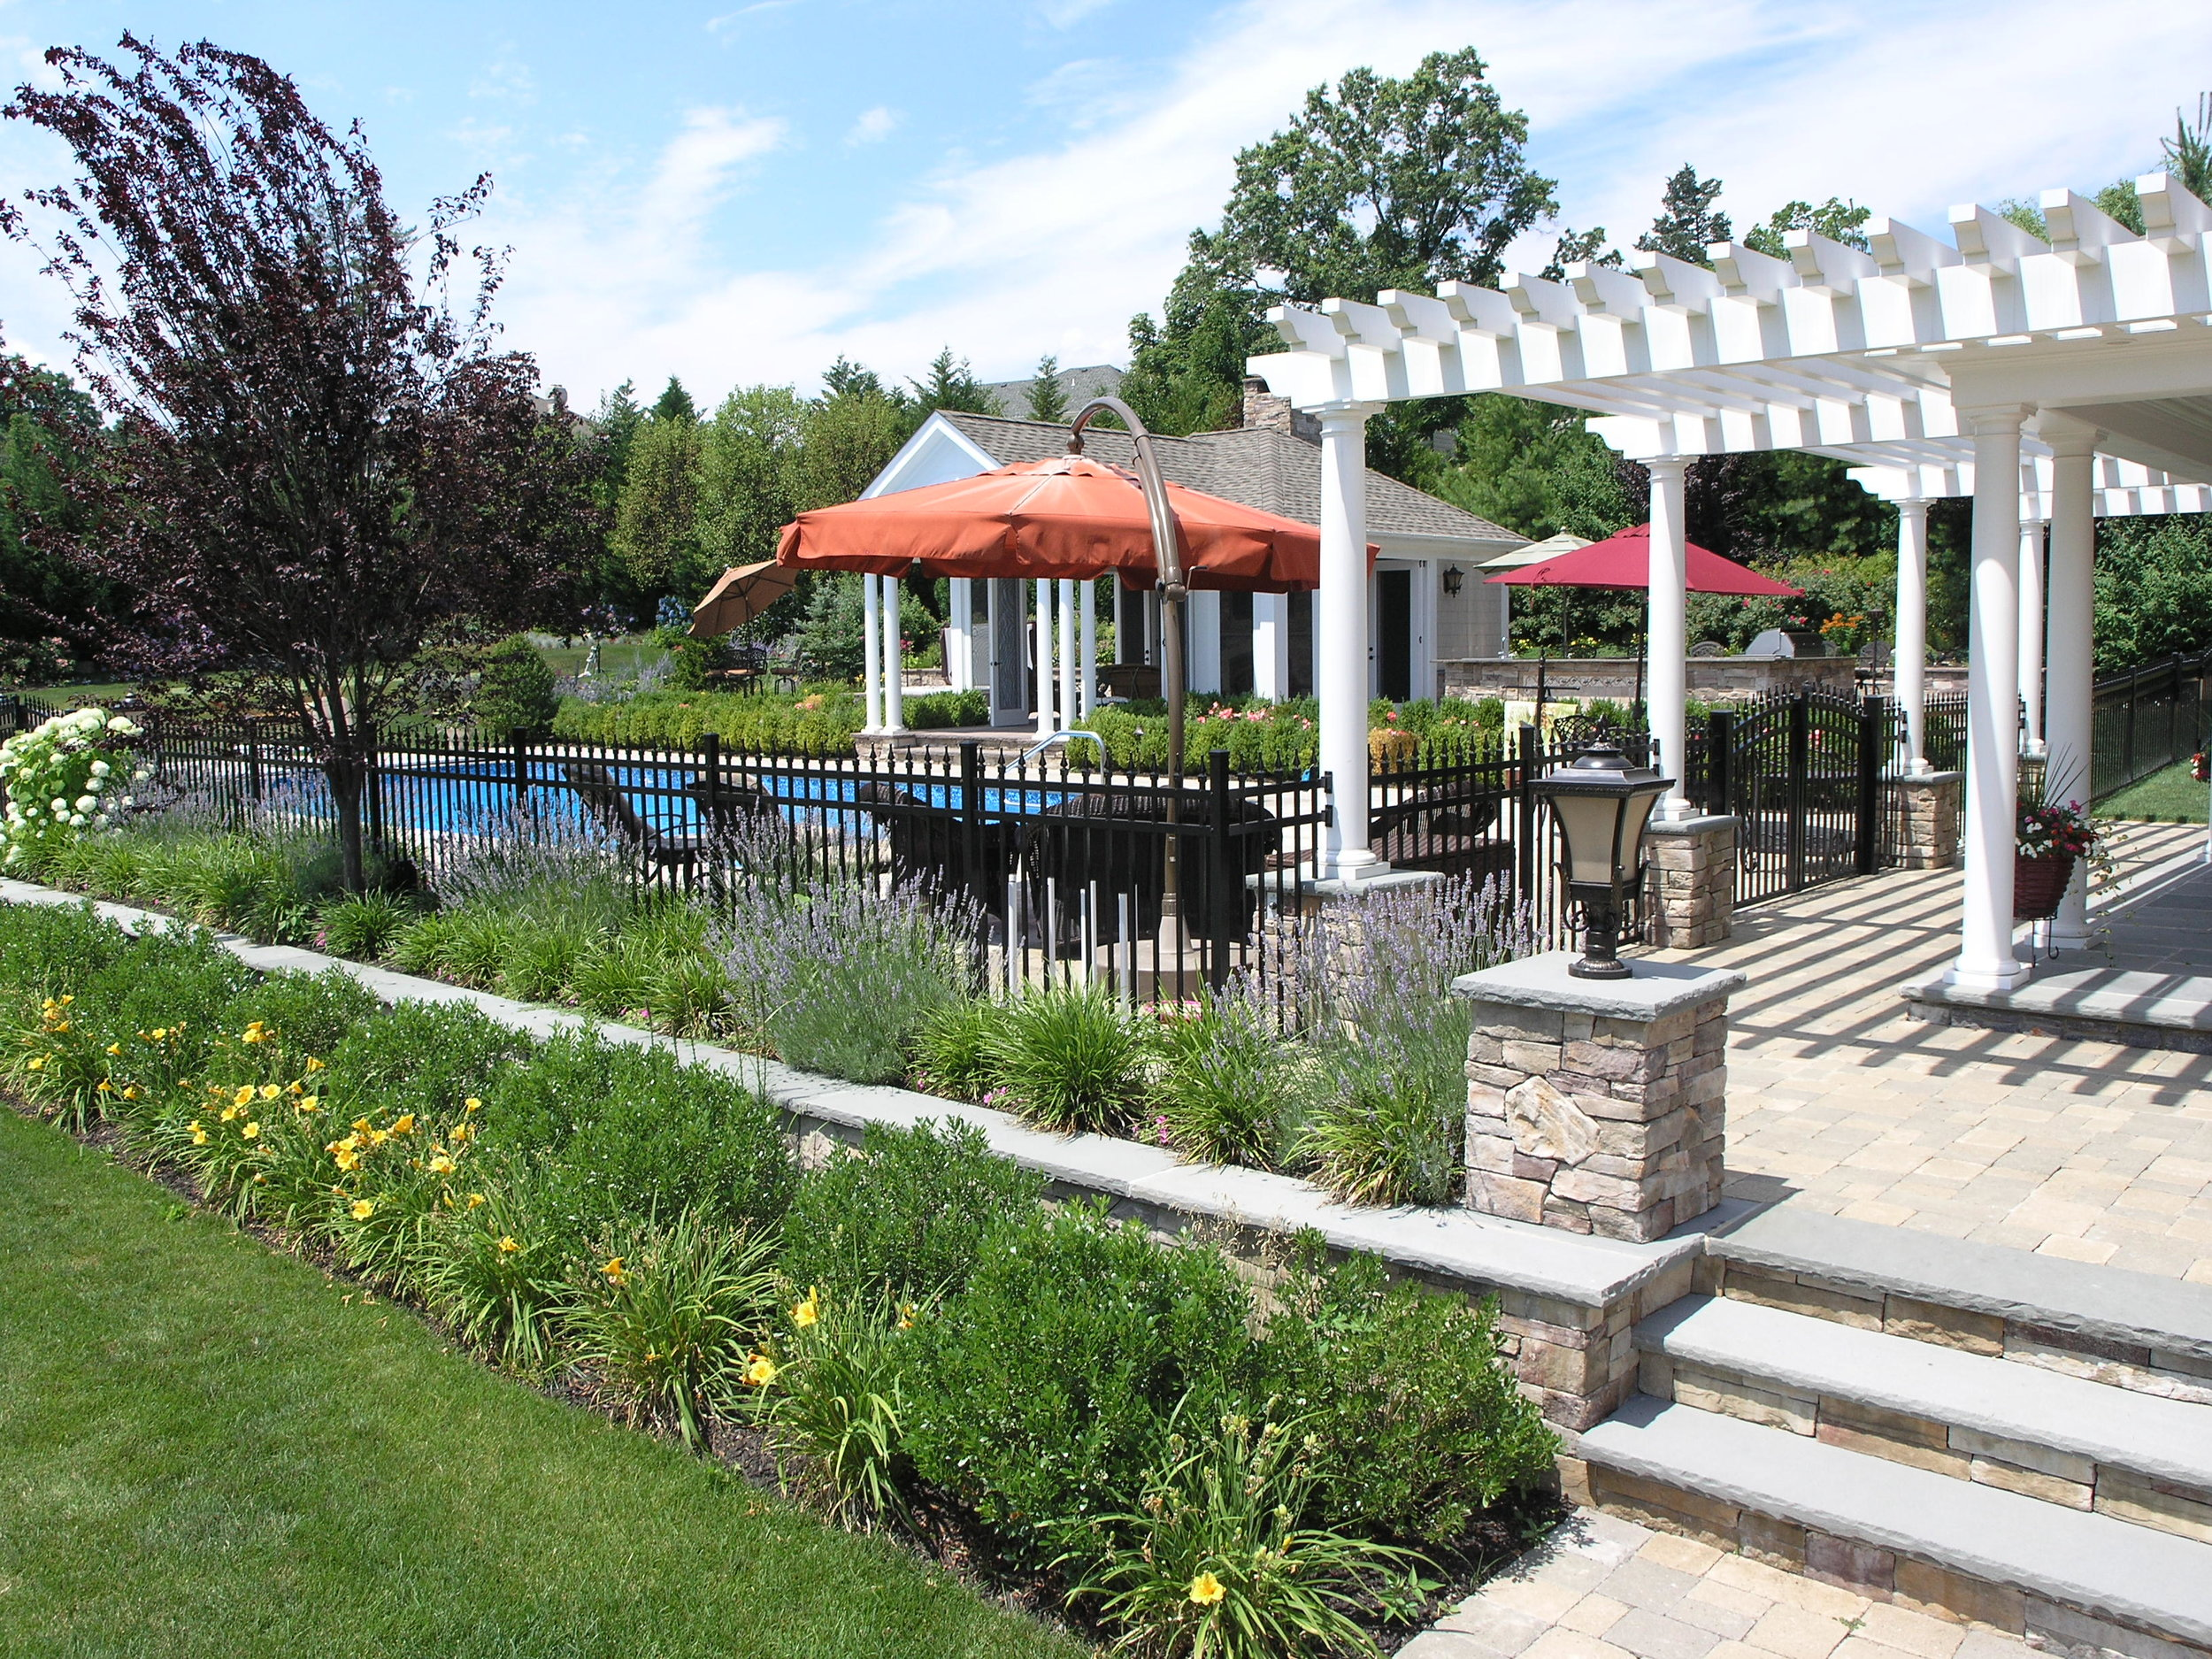 Professional pool pergola design company in Long Island, NY